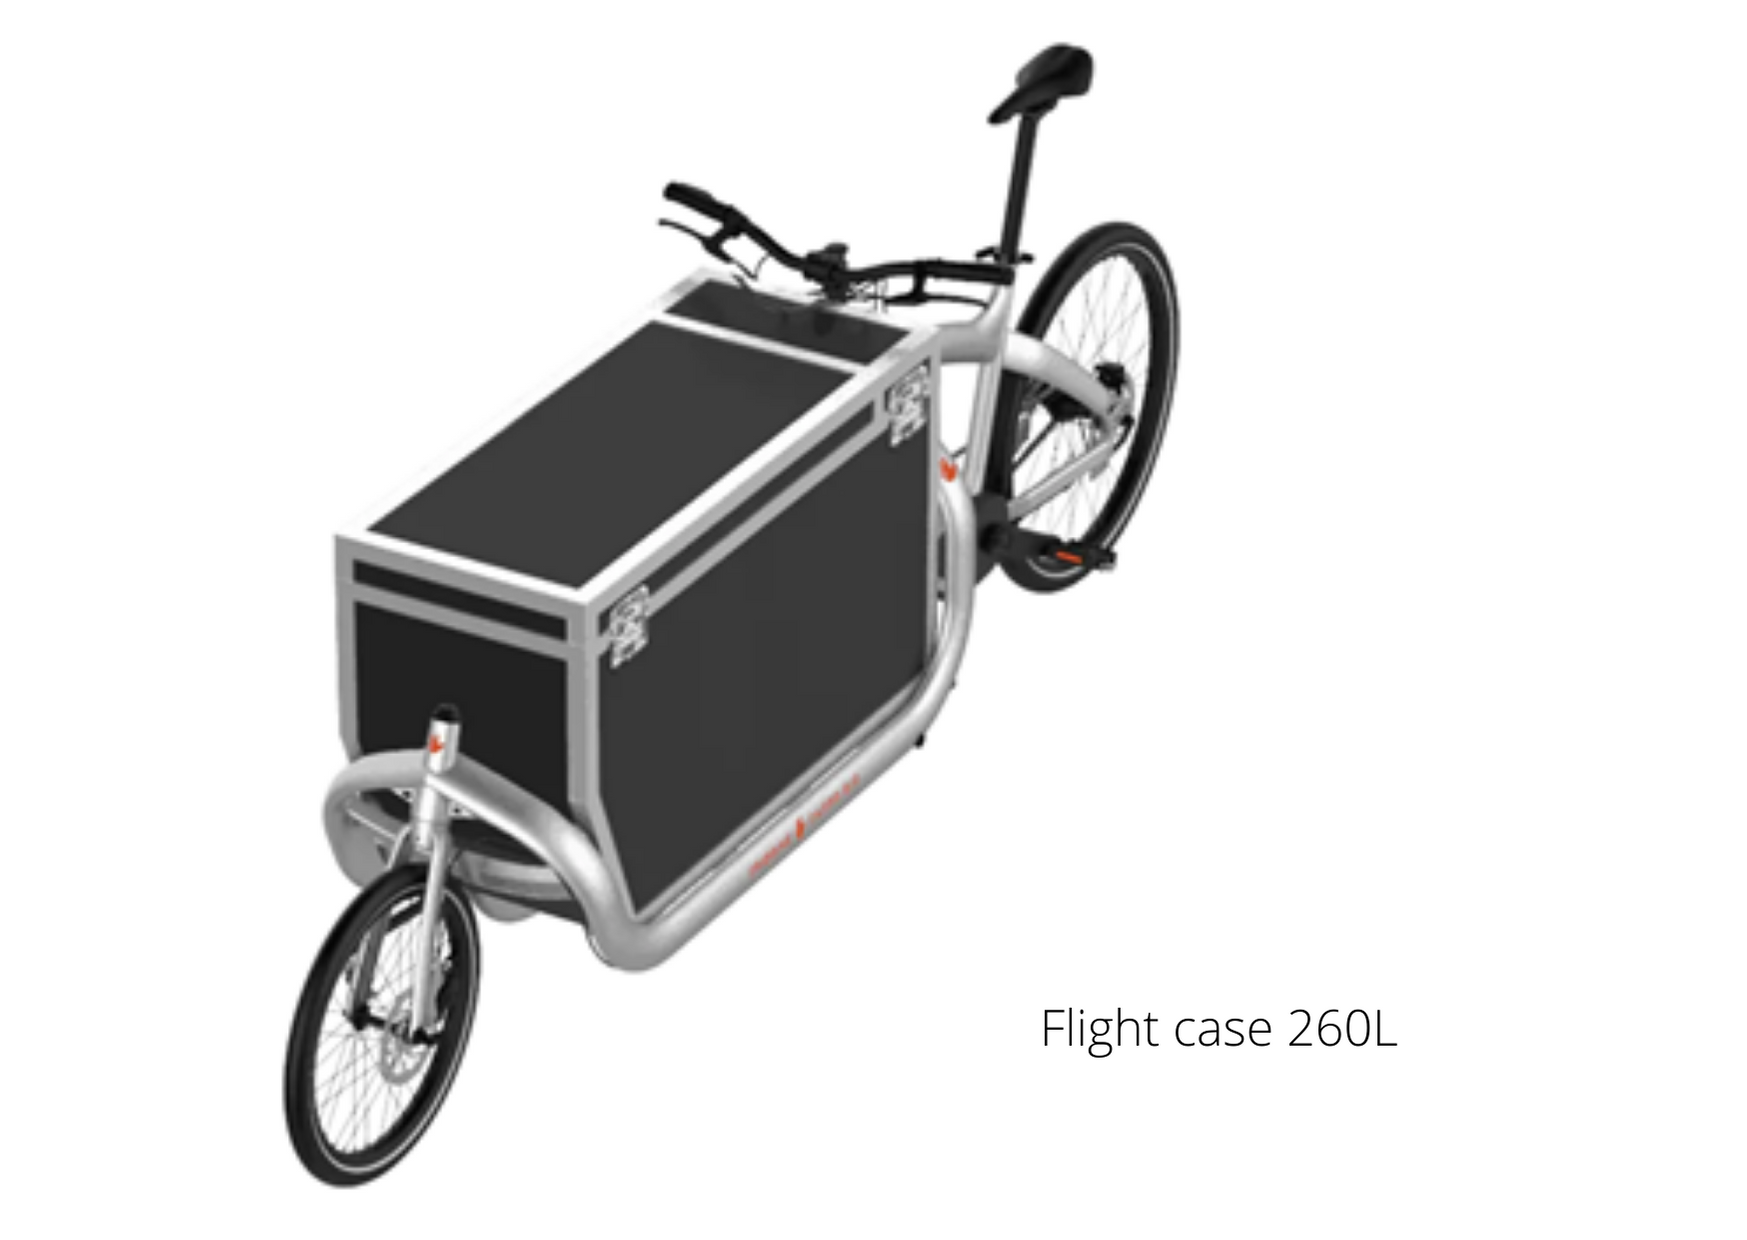 vélo cargo Triobike avec Flight case 465L